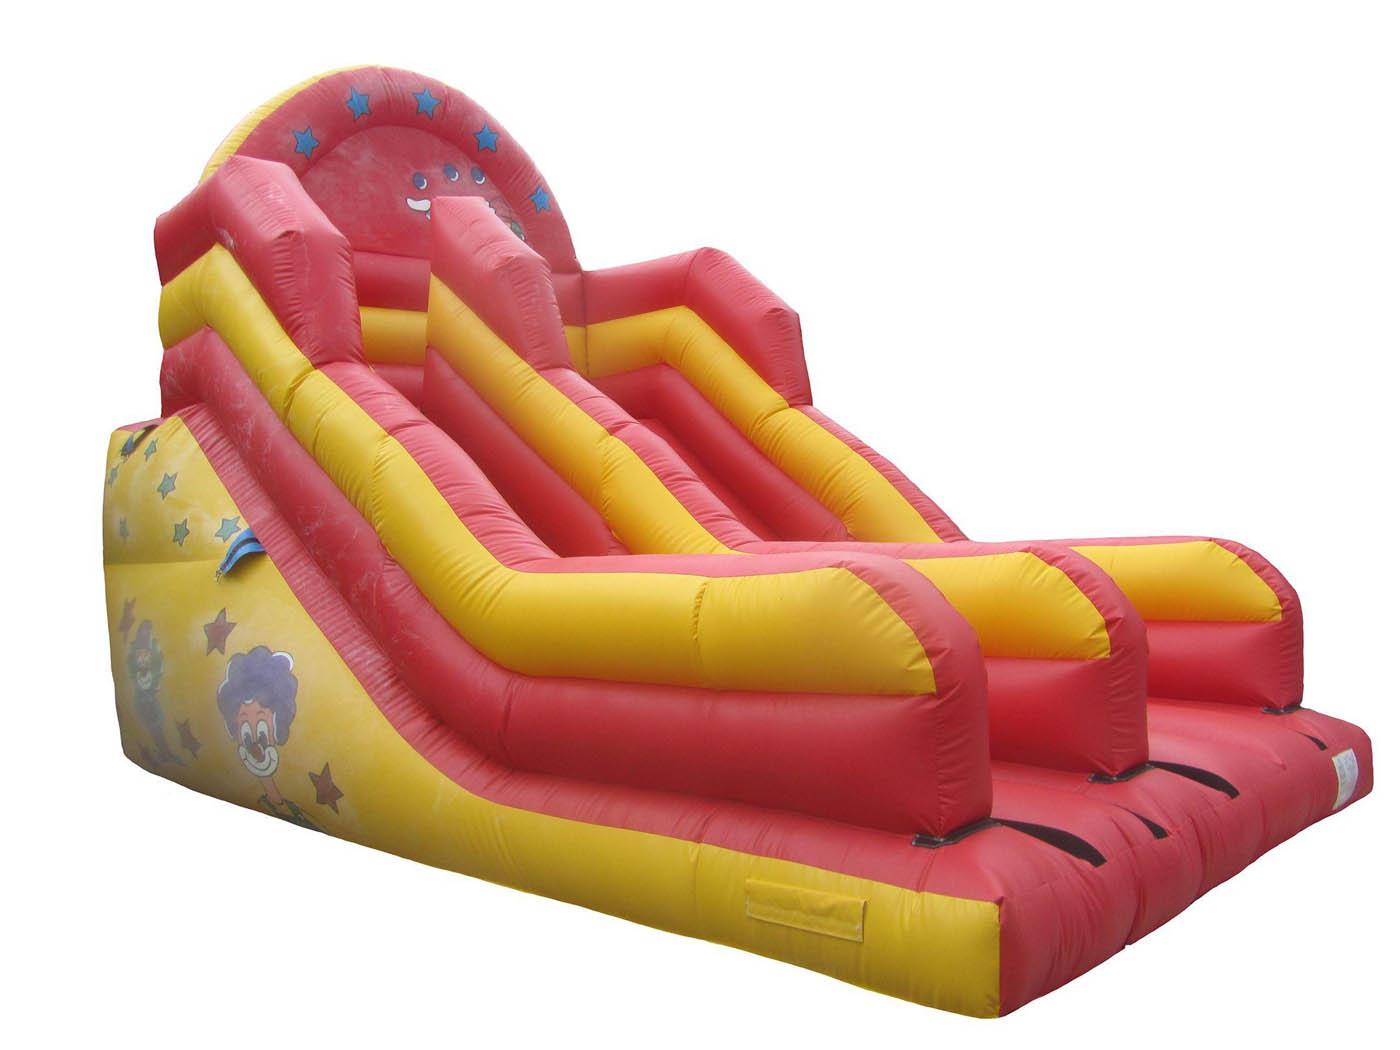 8ft-Bouncy-Slide-Clown-Bounce-compressor